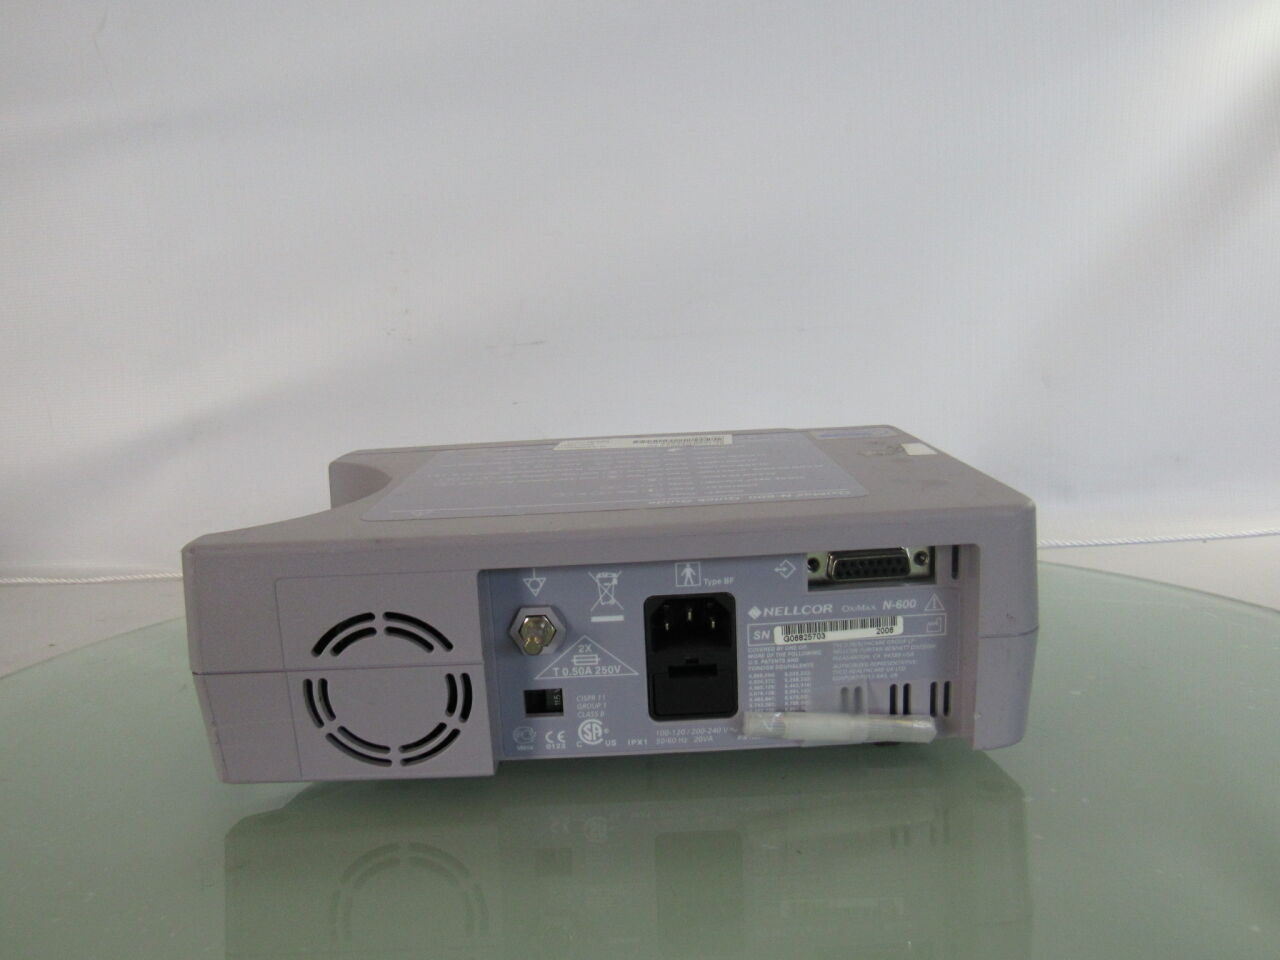 NELLCOR N-600 Oximeter - Pulse